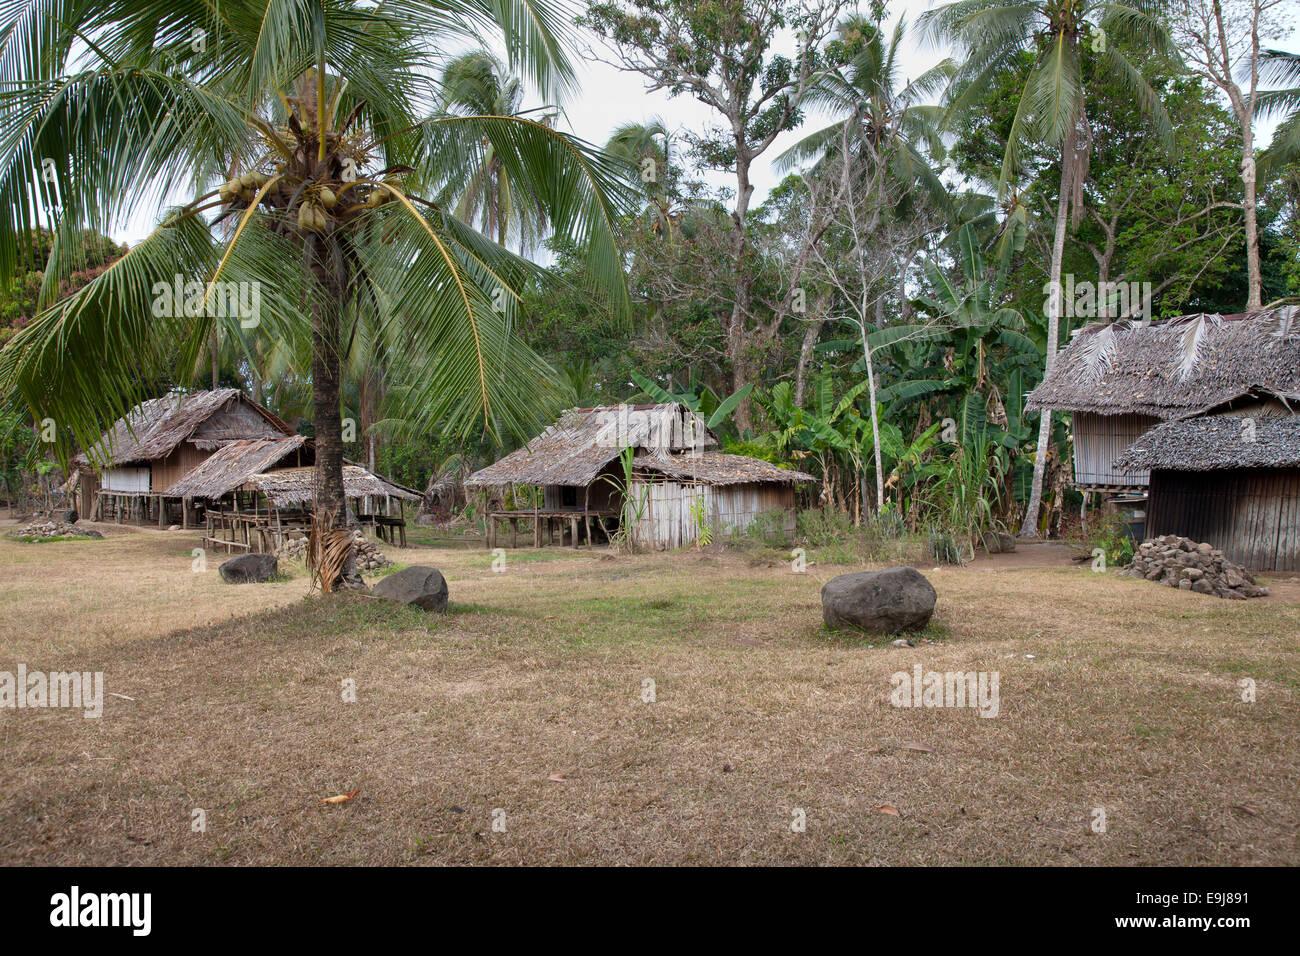 Stiled Houses in Yaugiwa Village, Northeastern Papua New Guinea - Stock Image